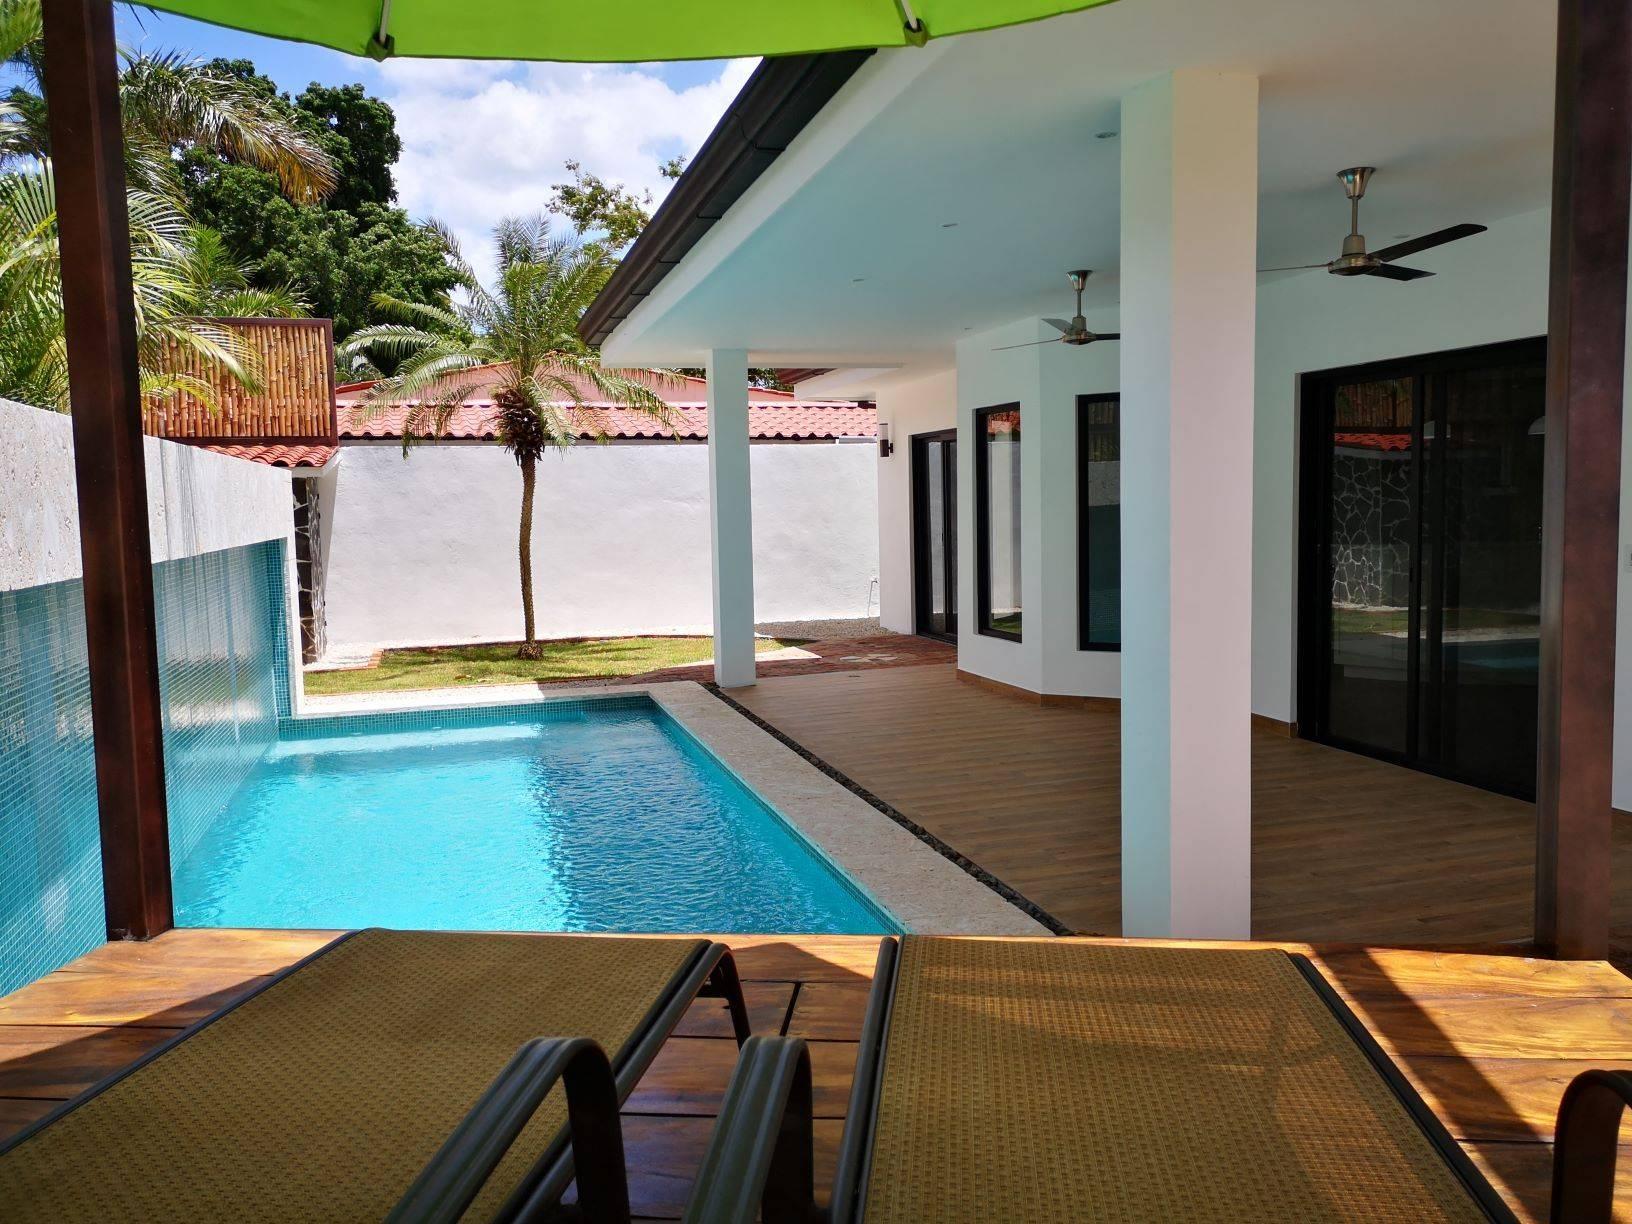 Brand new home $459K